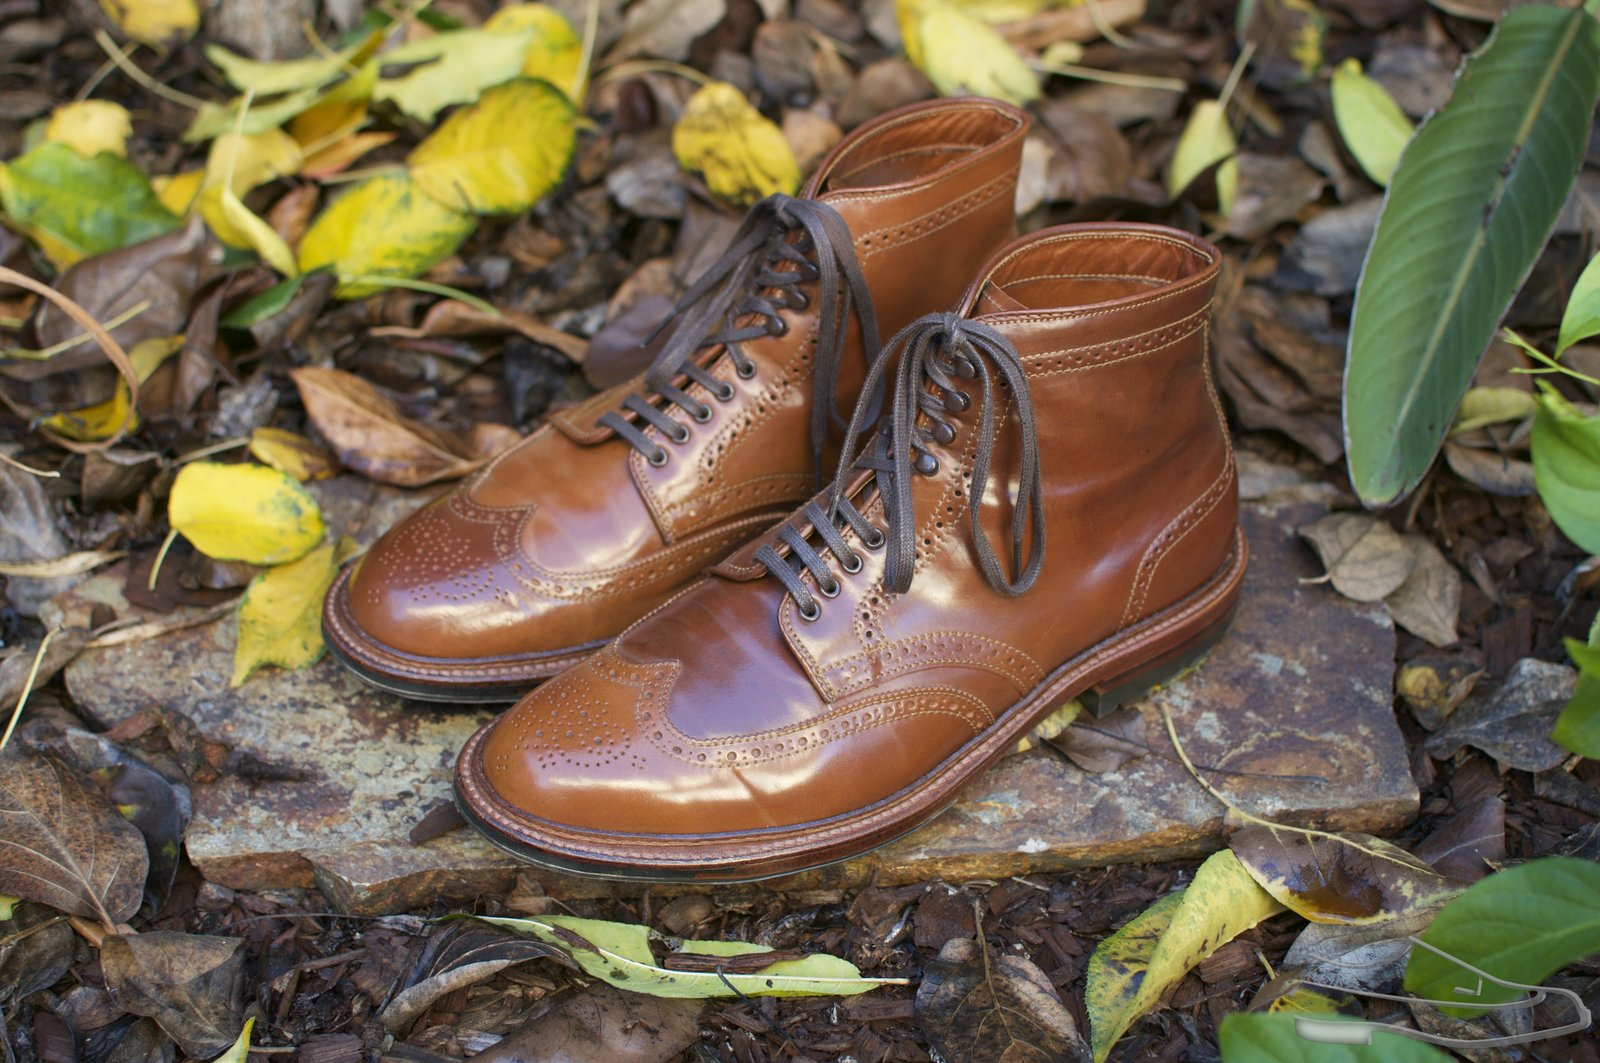 Alden Whiskey Shell Cordovan WT Boots - 2020-11-25 - 1.jpg